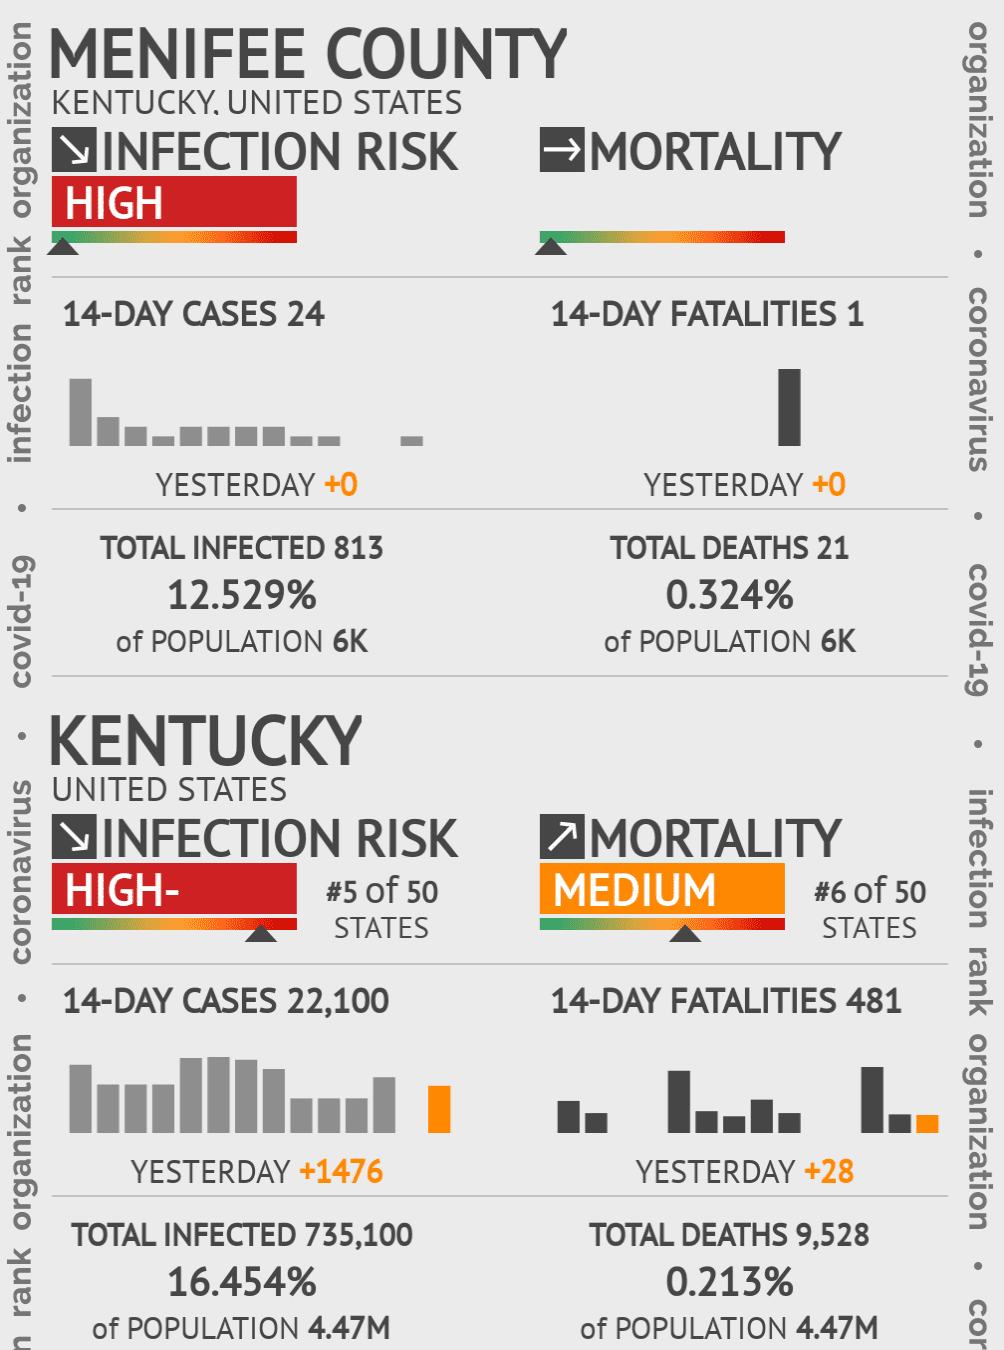 Menifee County Coronavirus Covid-19 Risk of Infection on July 24, 2021